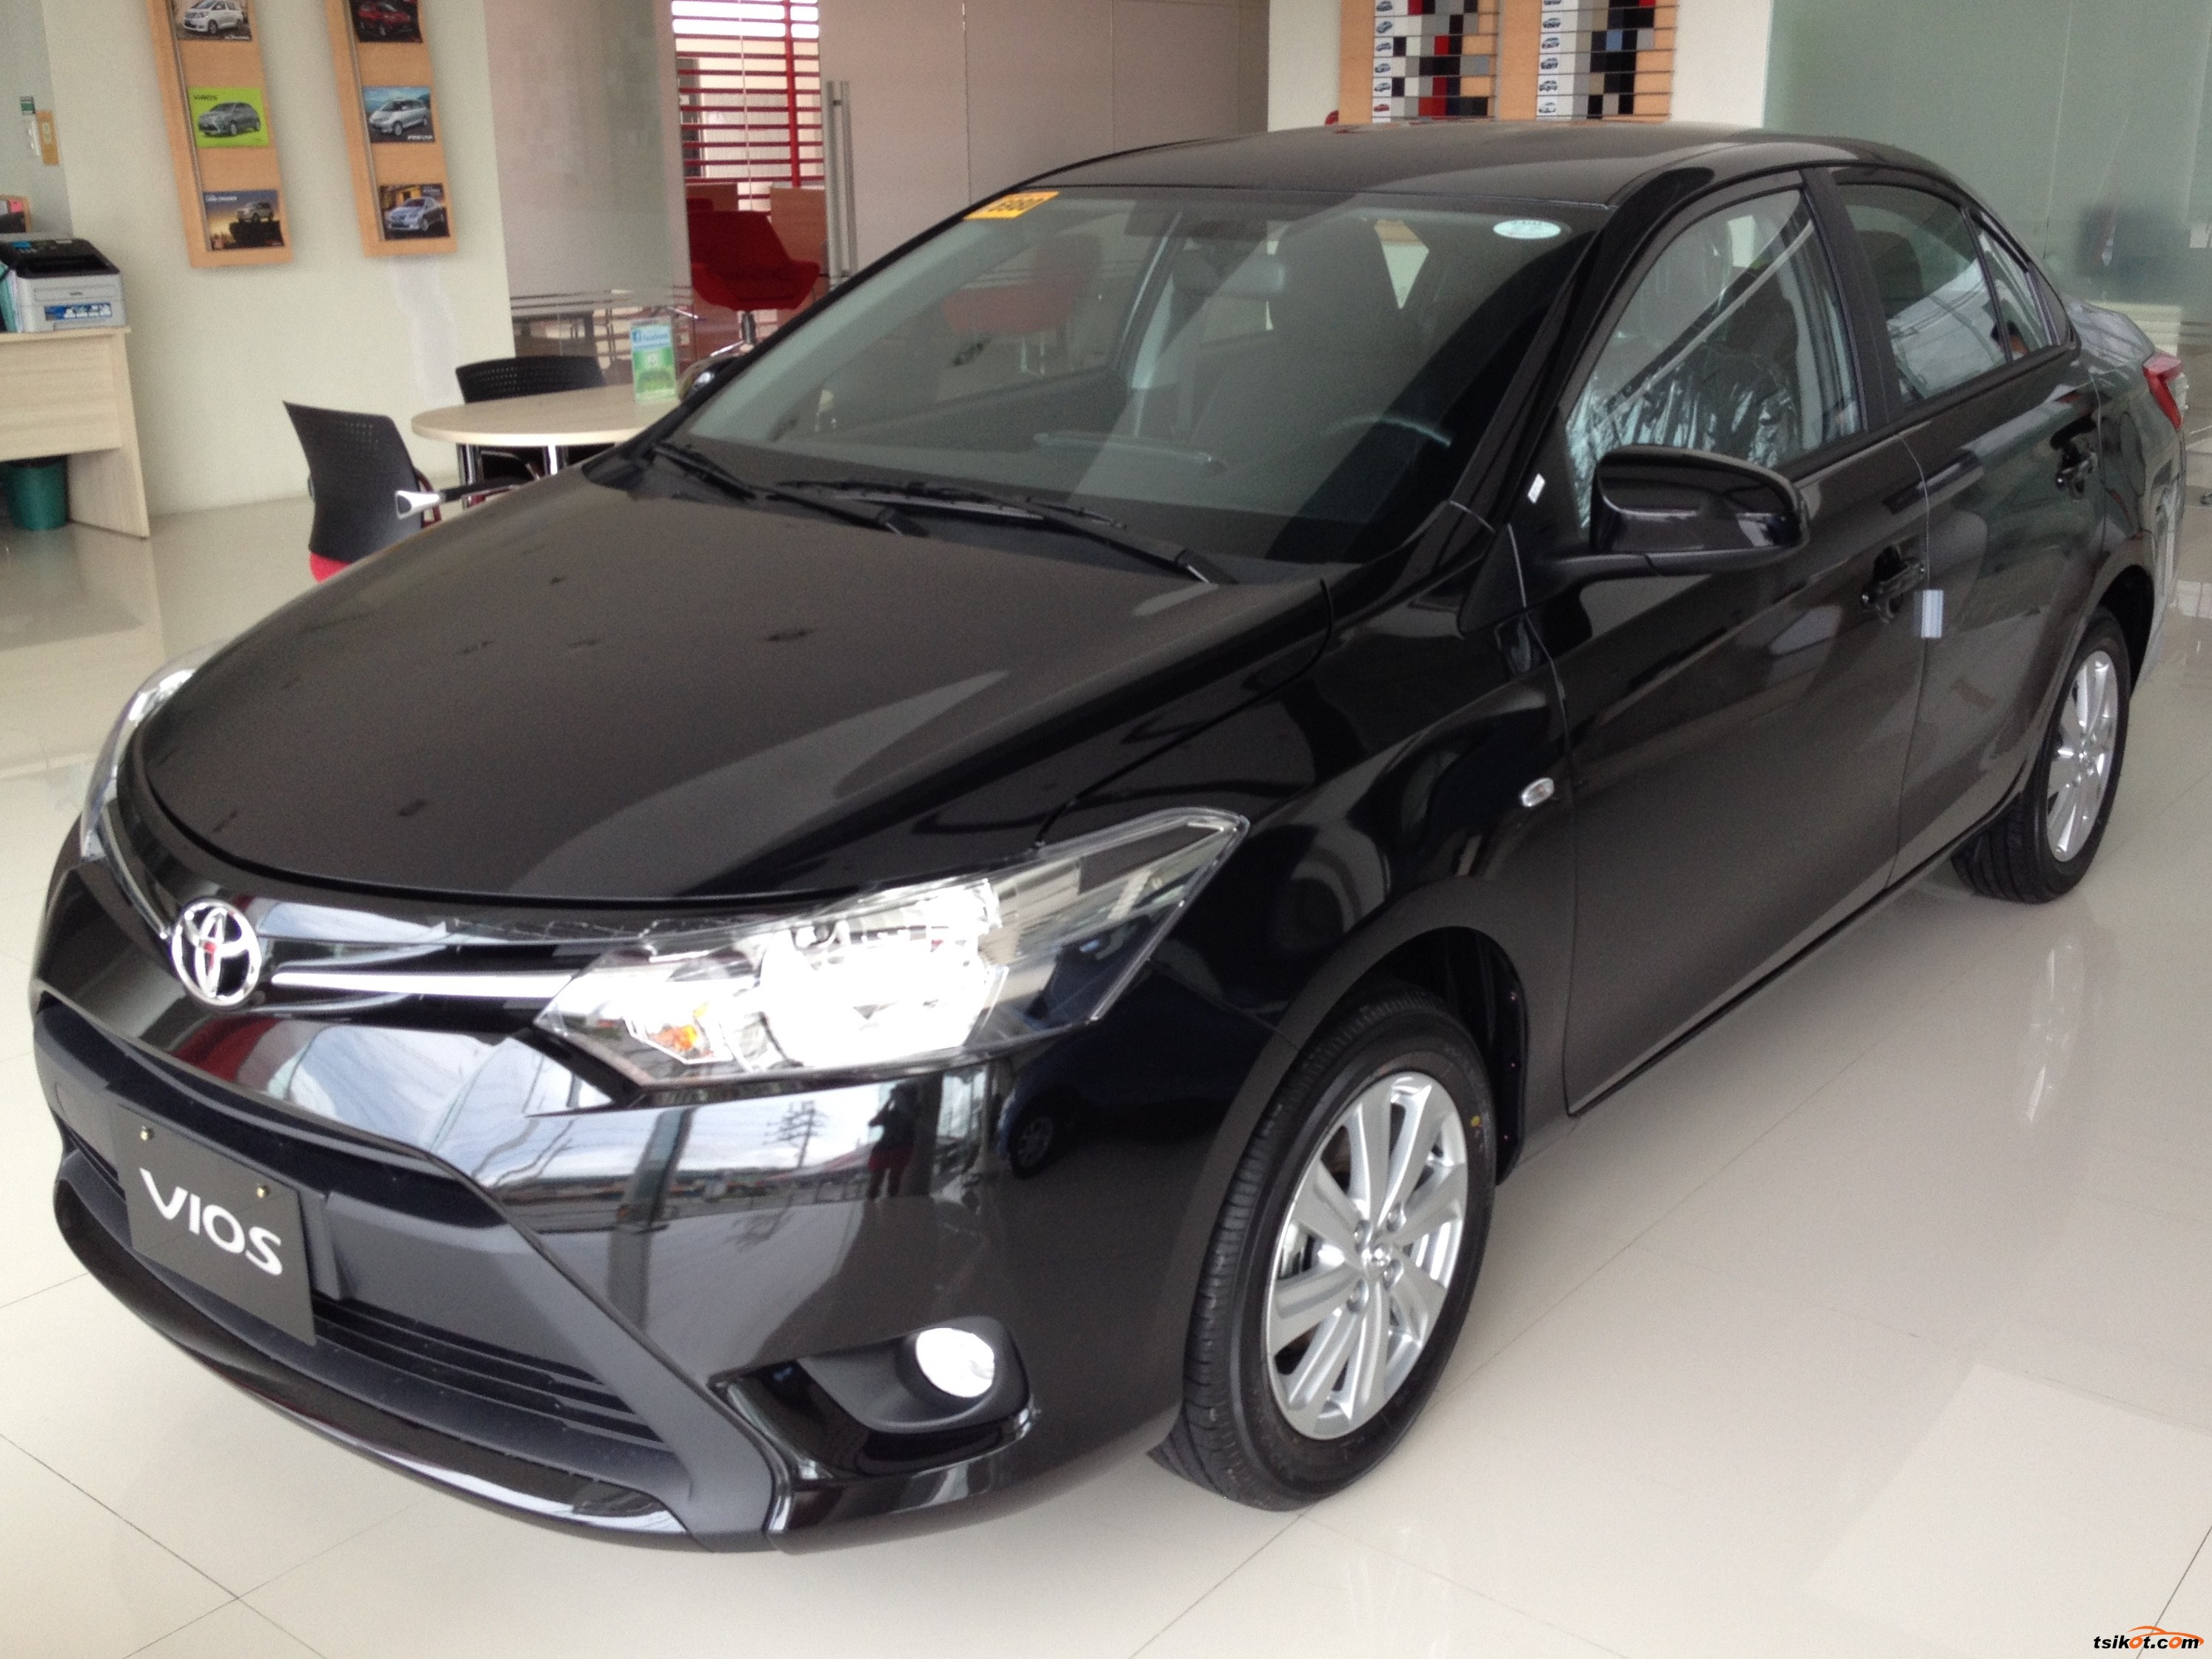 toyota vios 2016 car for sale central luzon philippines. Black Bedroom Furniture Sets. Home Design Ideas